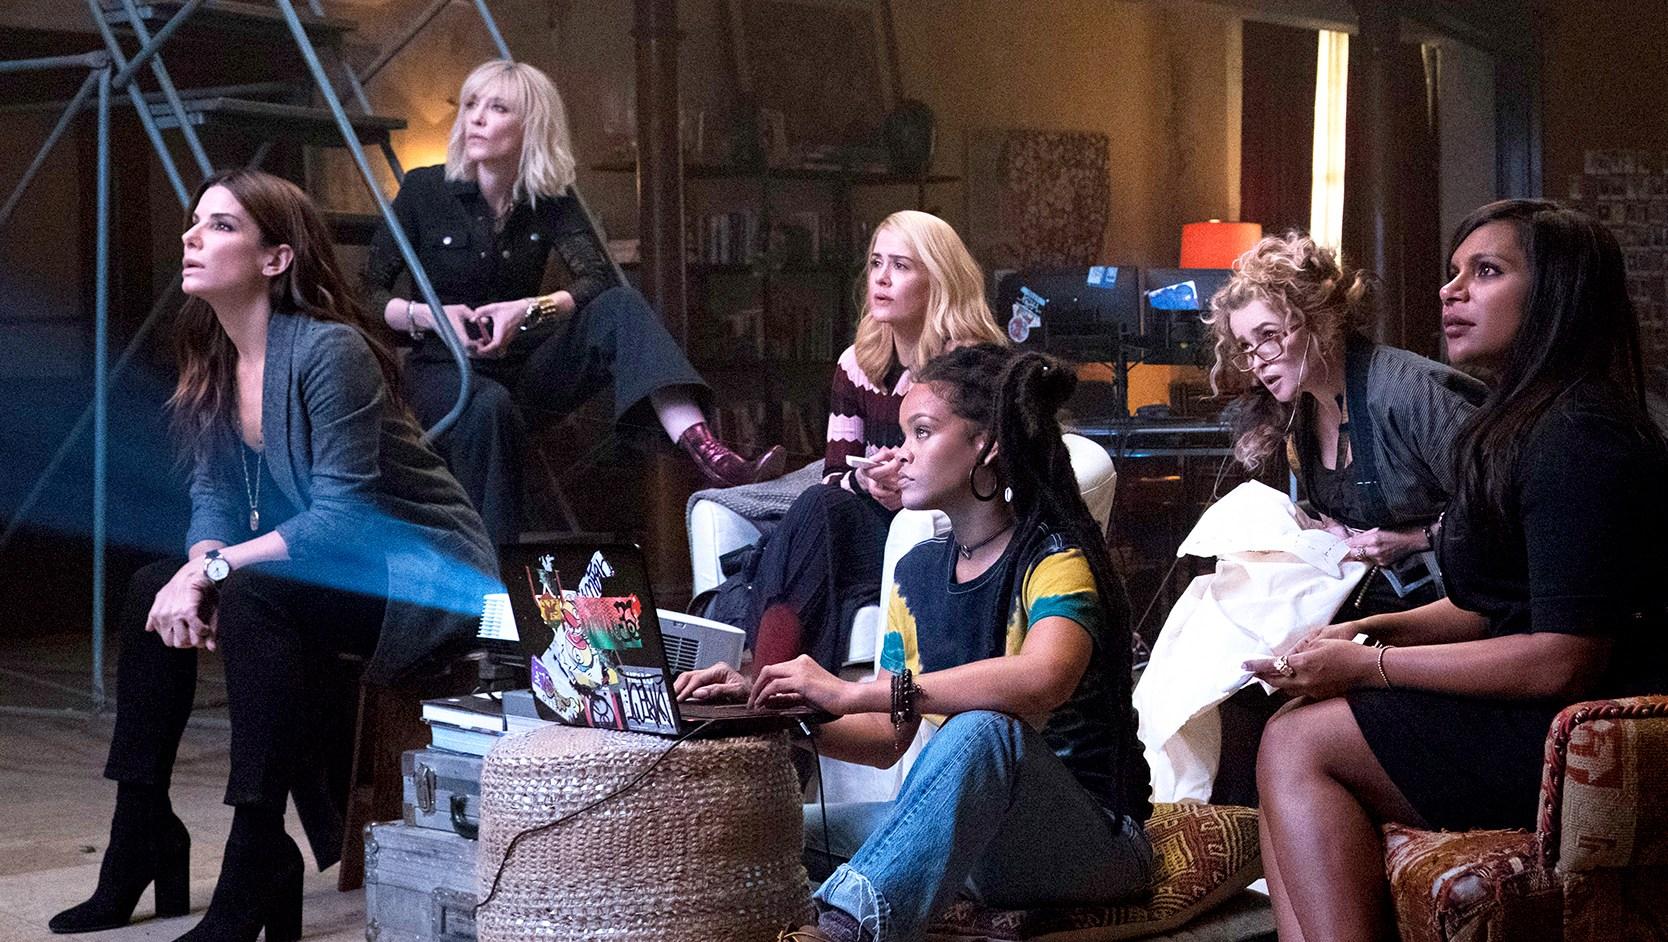 Sandra Bullock, Cate Blanchett, Sarah Paulson, Rihanna, Helena Bonham Carter, Mindy Kaling and Awkwafina in 'Ocean's 8'